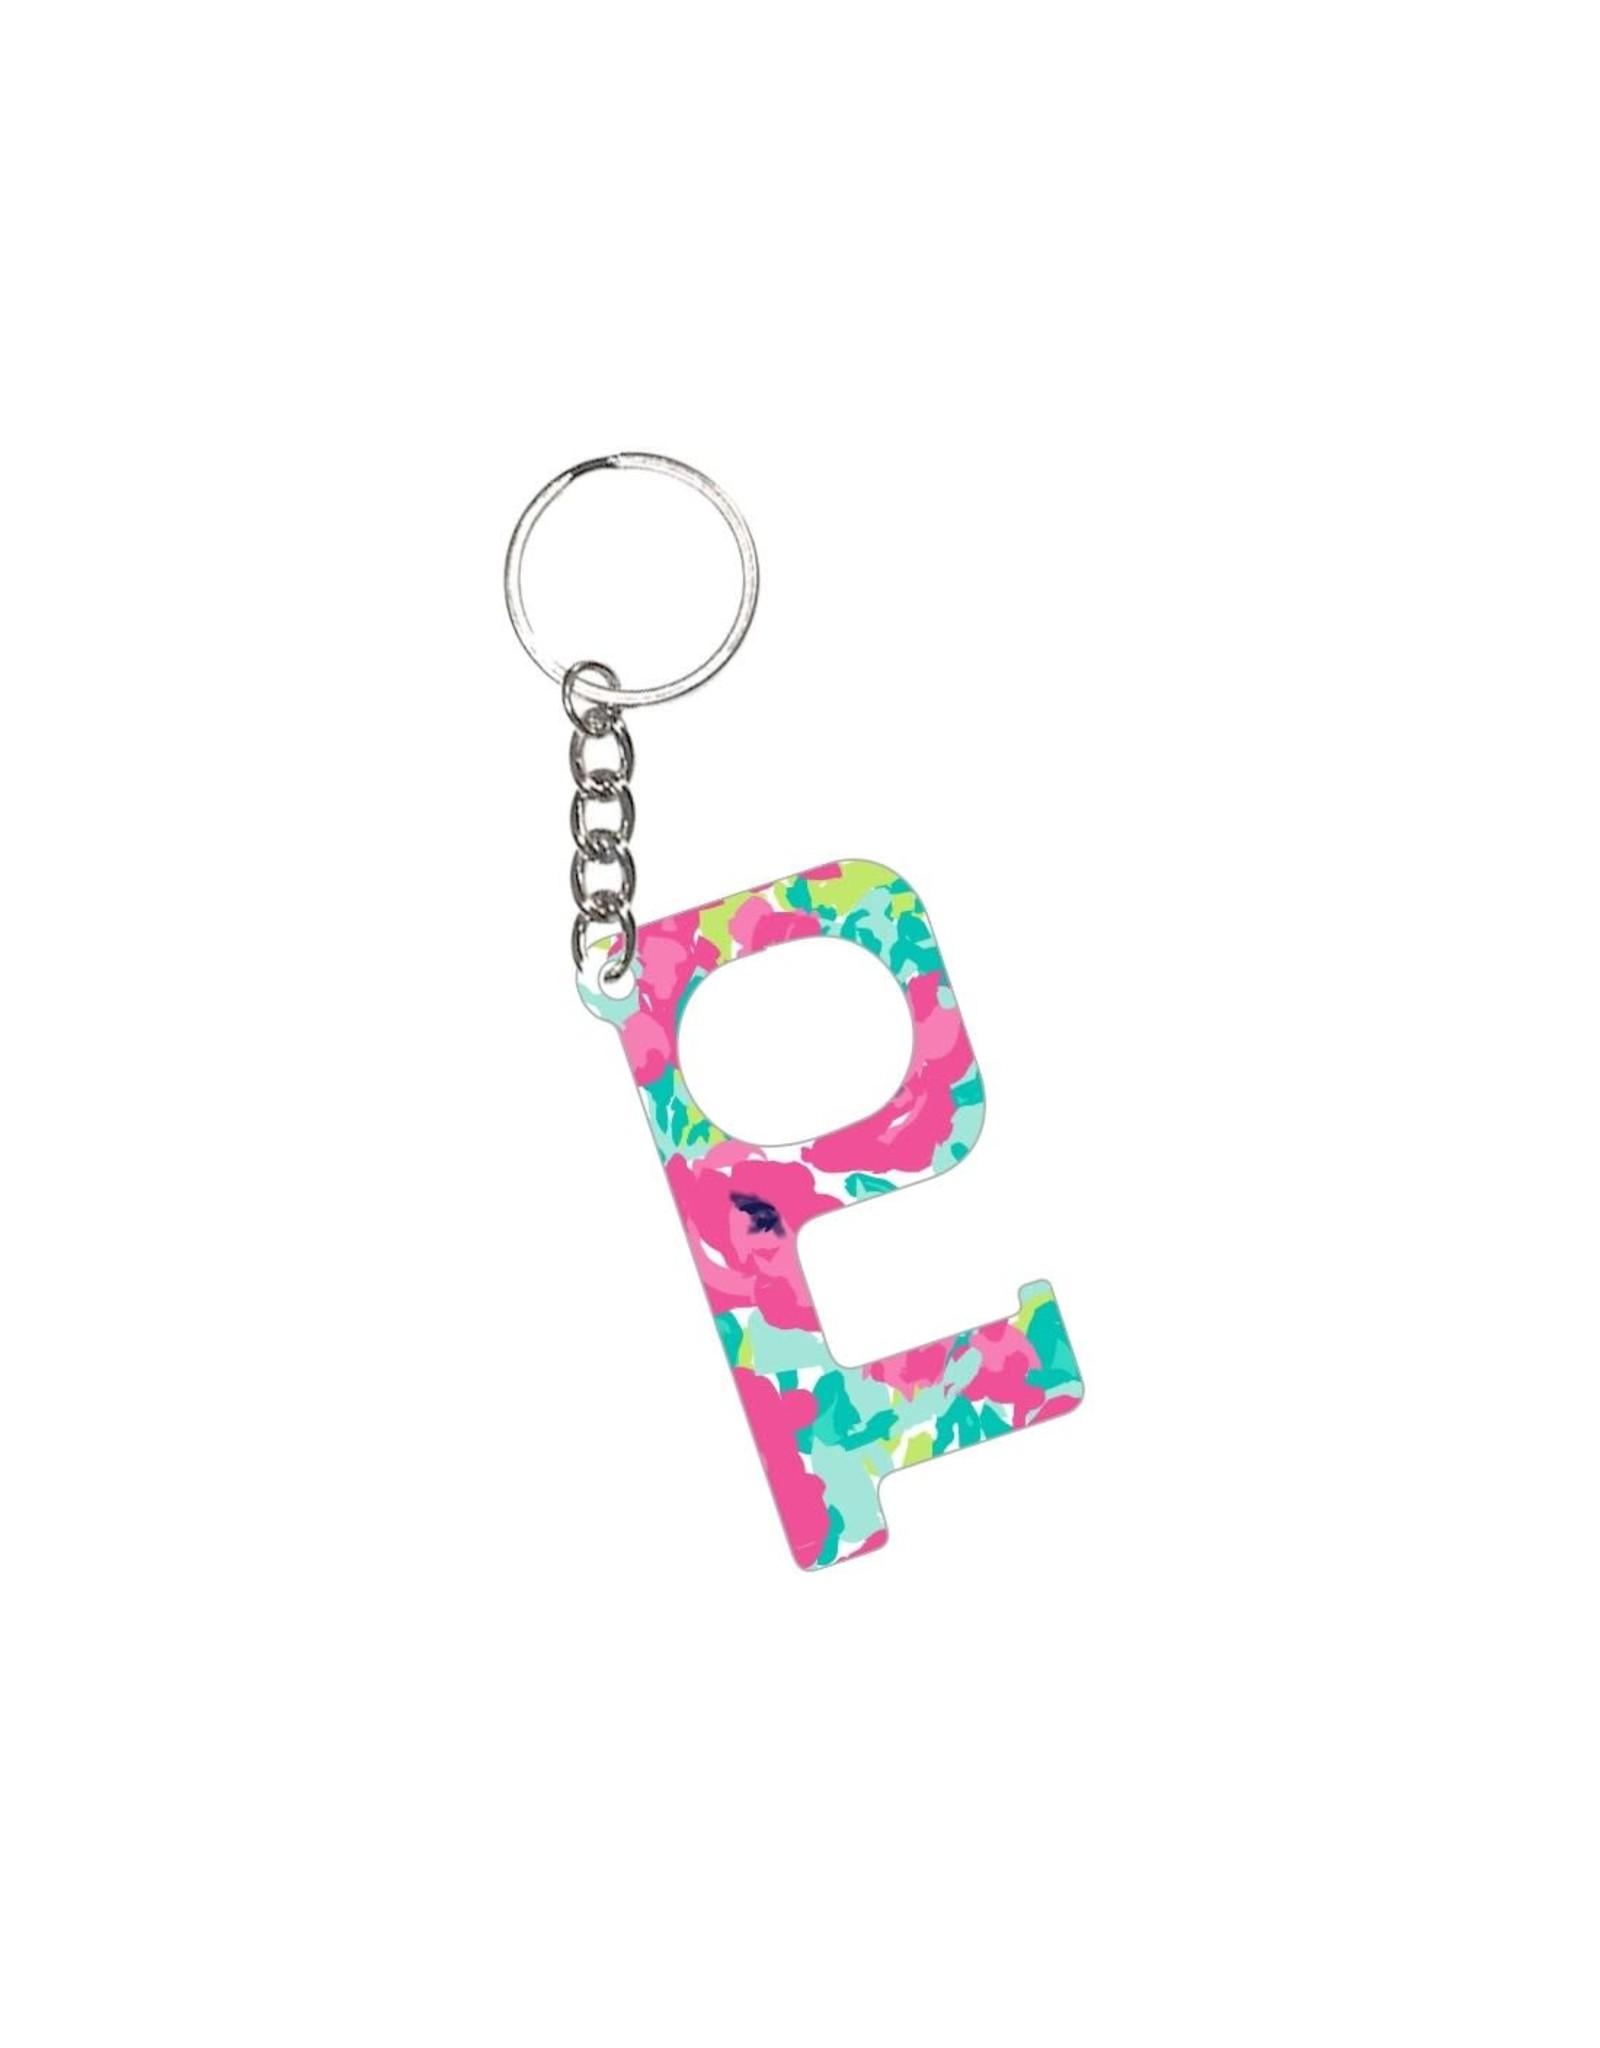 Acrylic Door Key, Grace